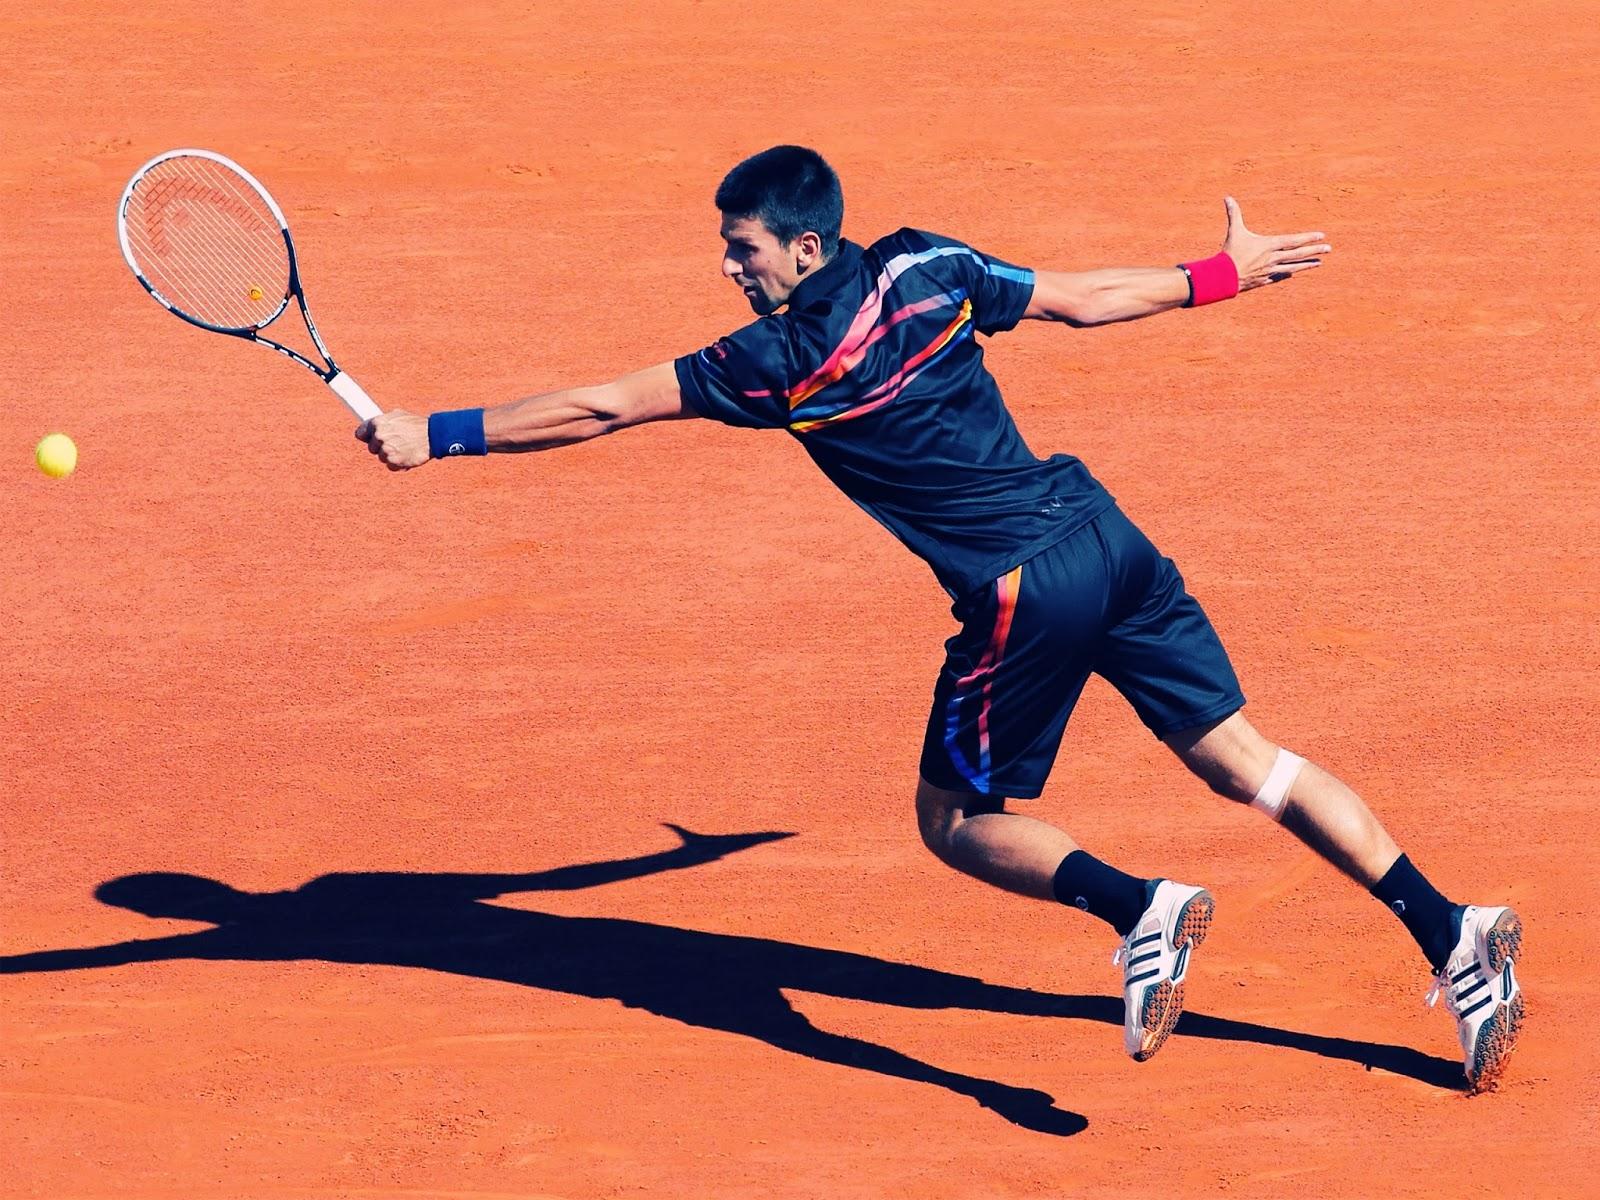 Novak Djokovic Beautiful New HD Wallpapers 2014 3D Tennis Wallpaper 1600x1200